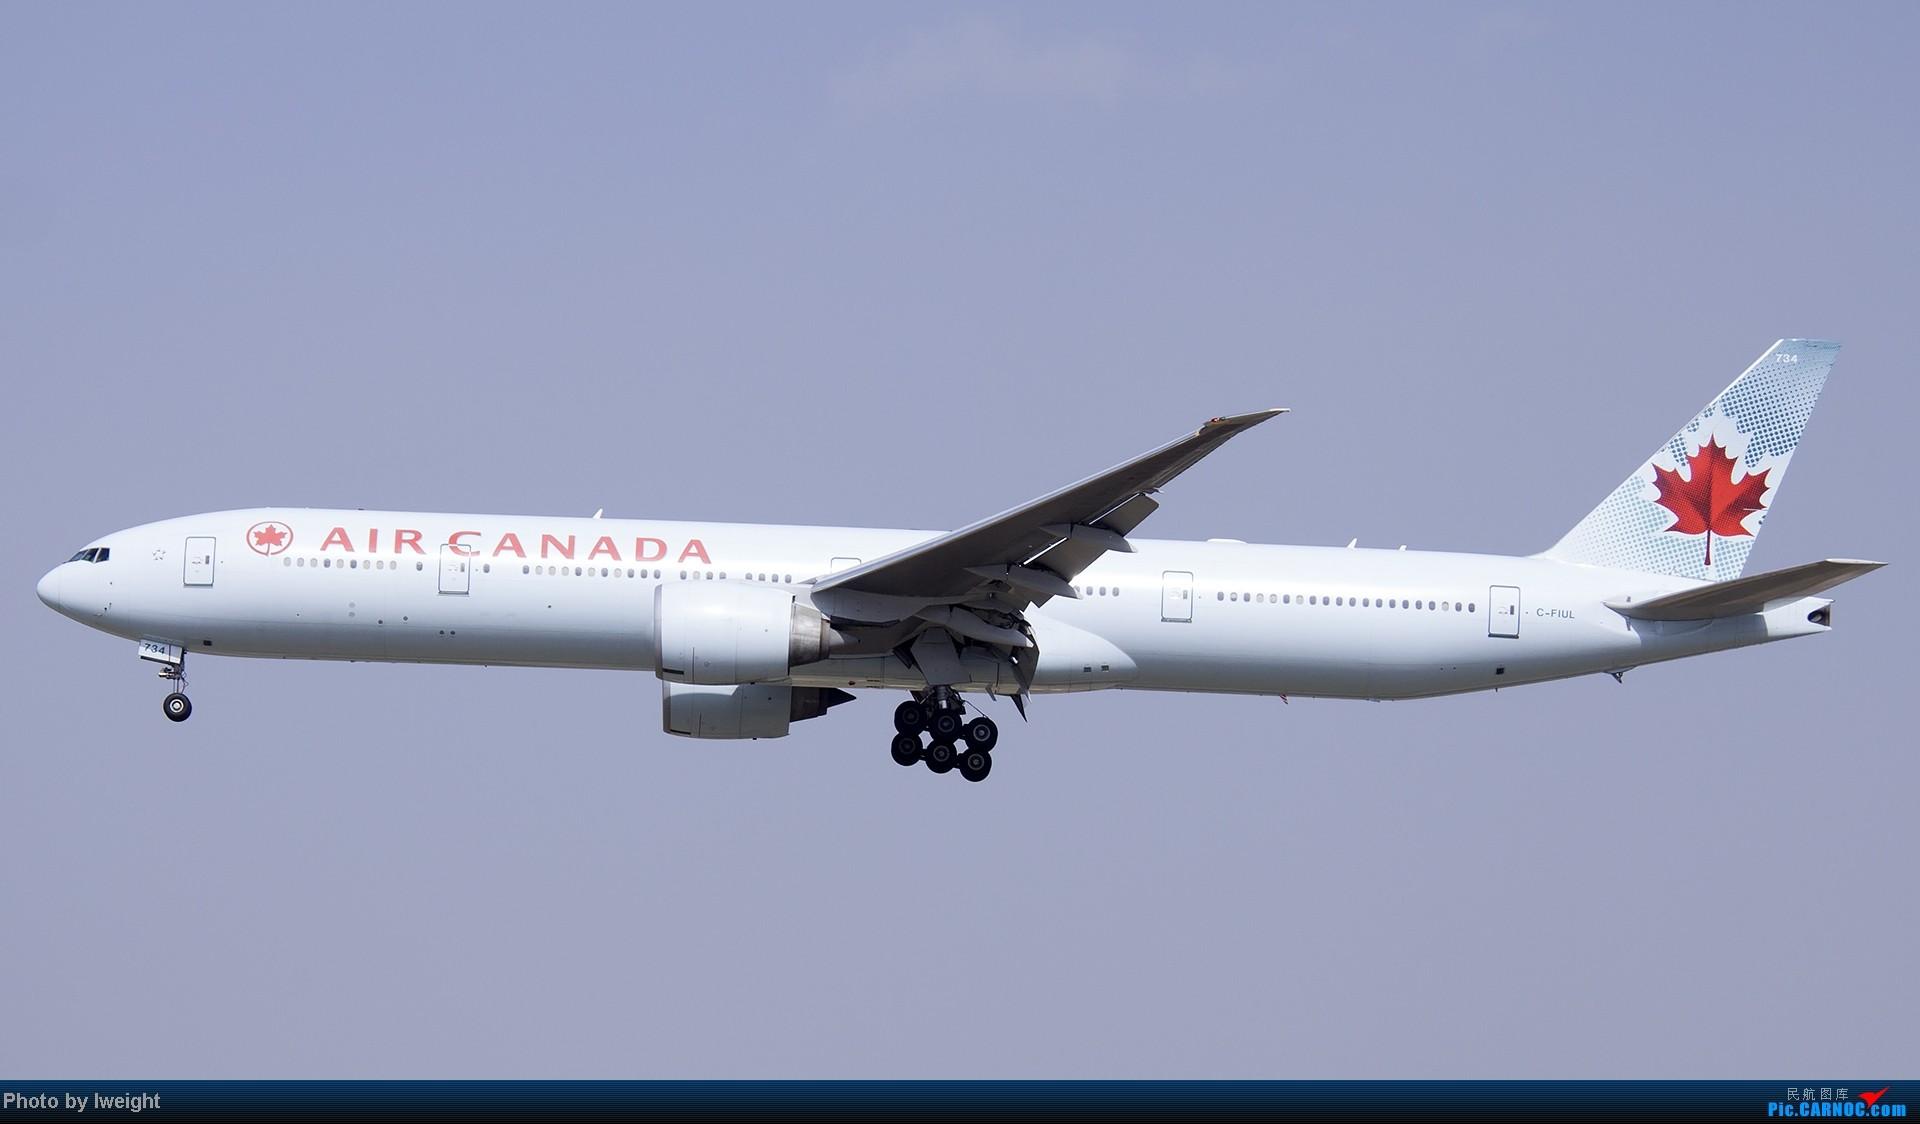 Re:[原创]5月3日首都机场风云变幻的下午 BOEING 777-300 C-FIUL 中国北京首都机场